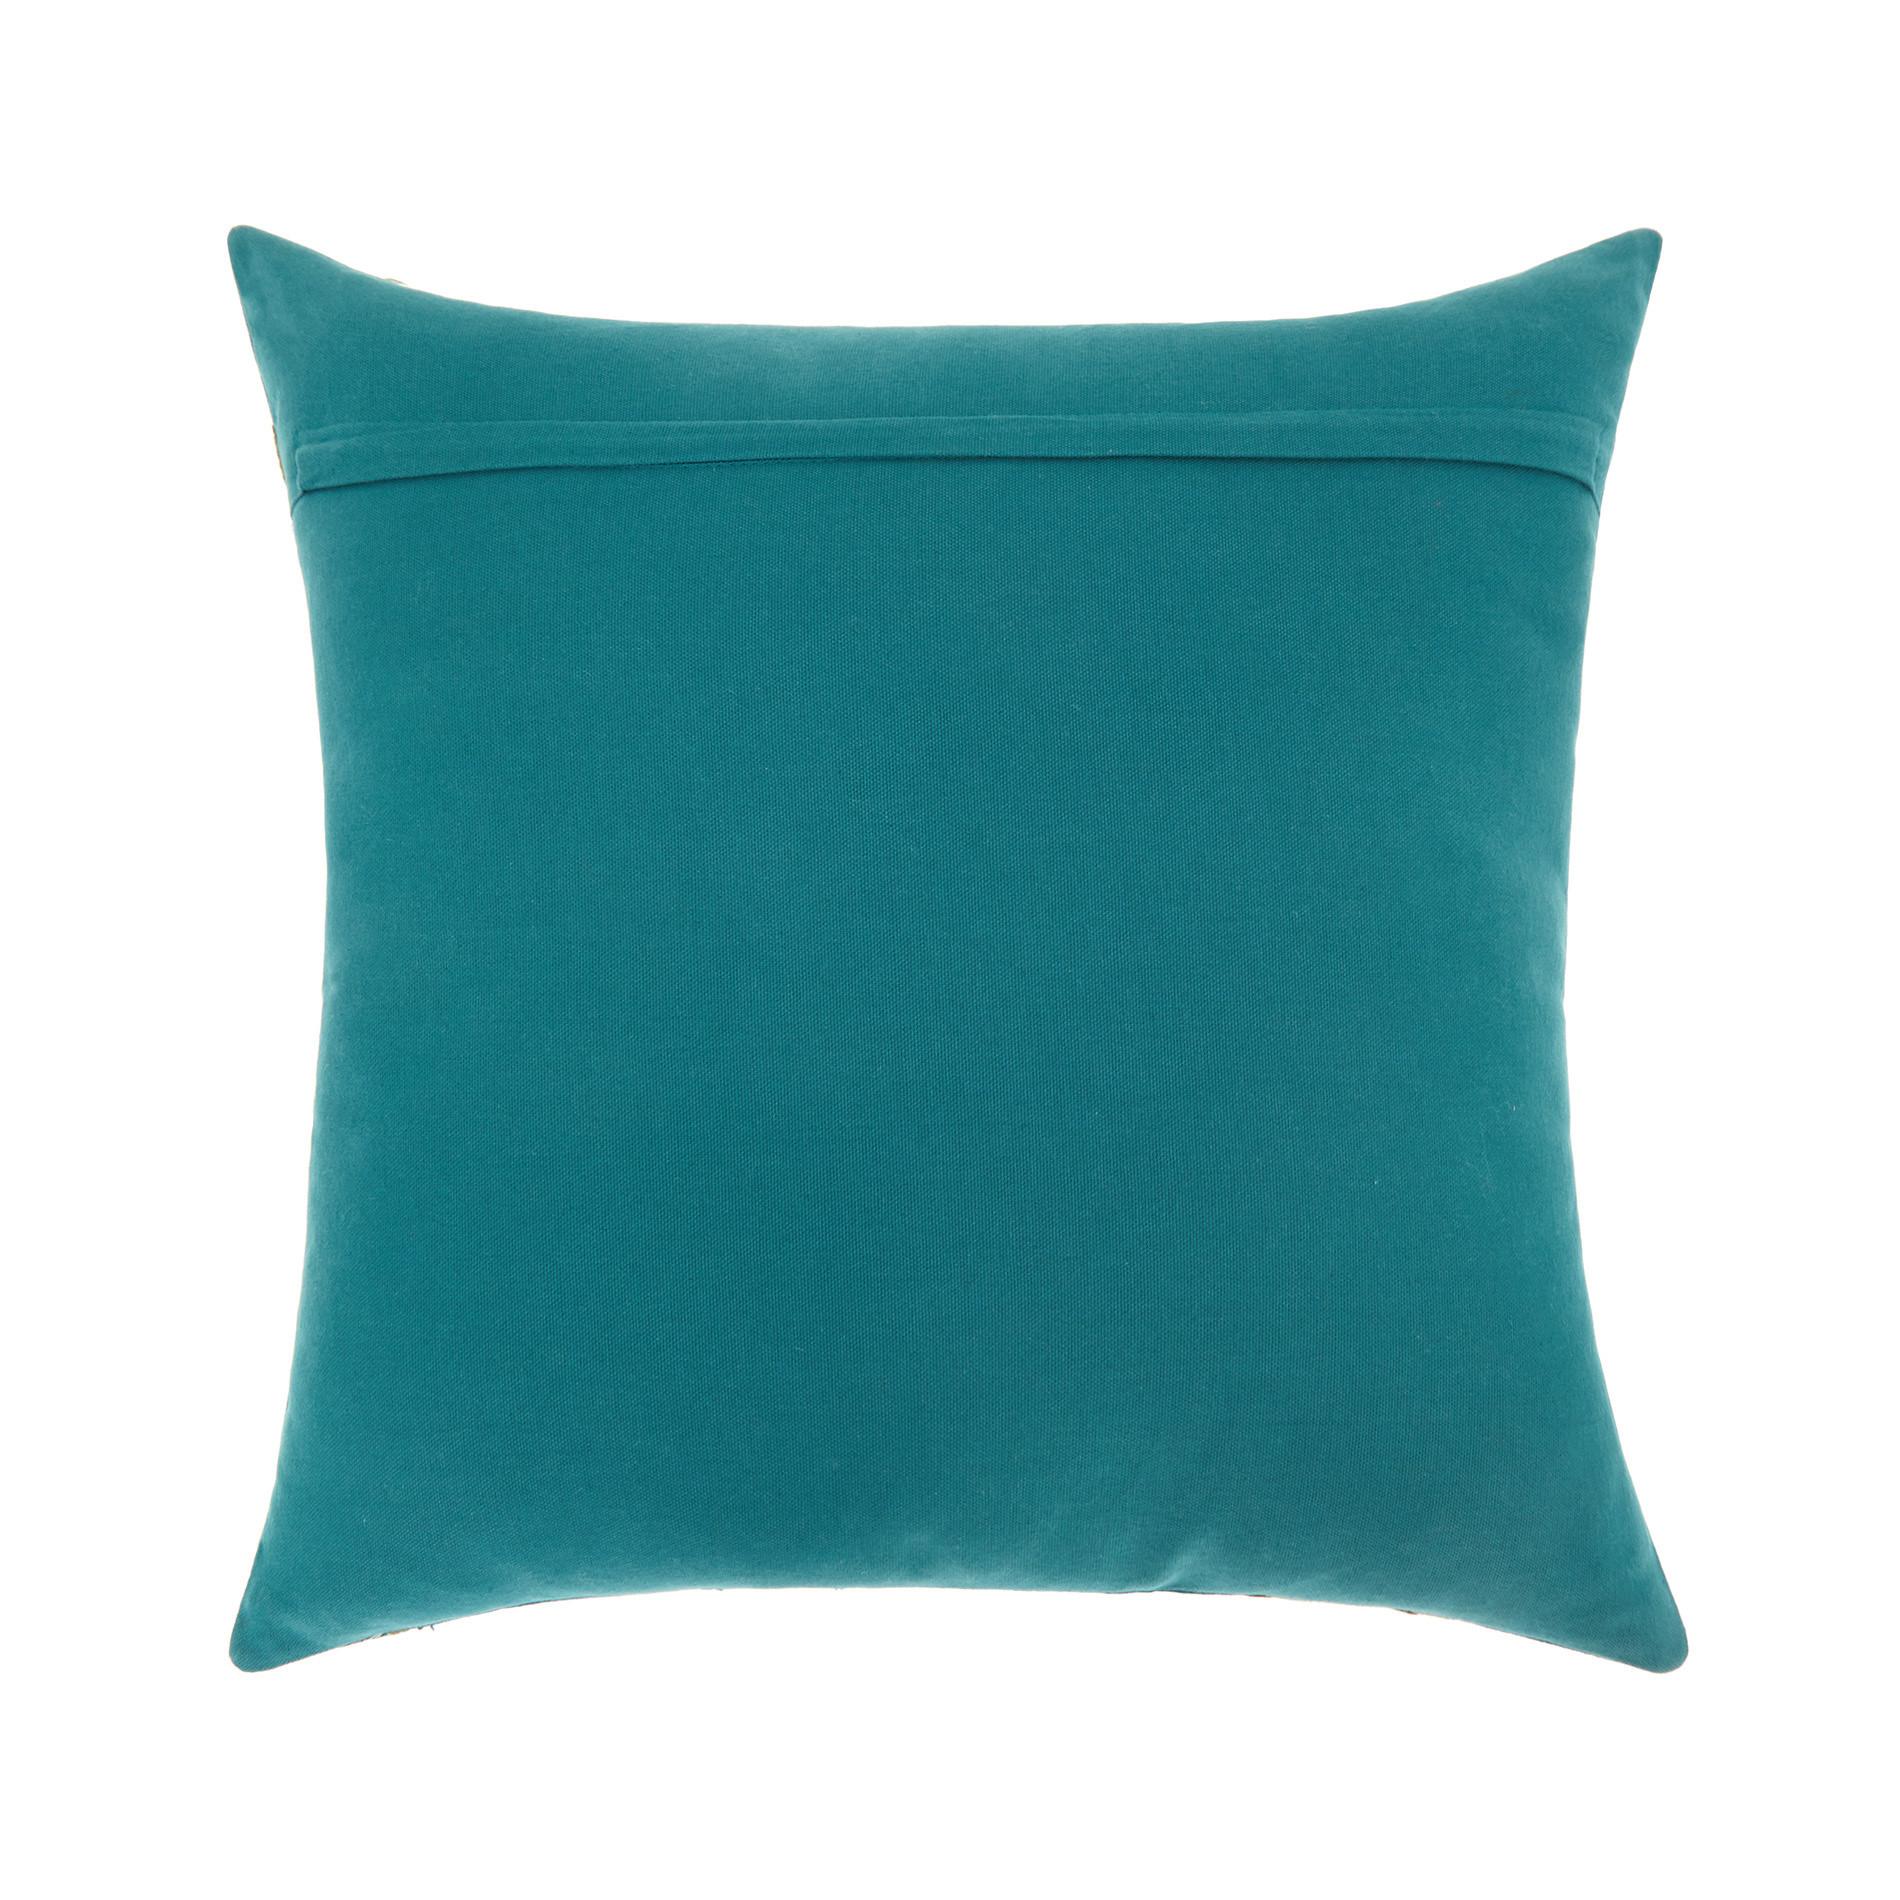 Cuscino ricamo foglie 45x45cm, Verde smeraldo, large image number 1